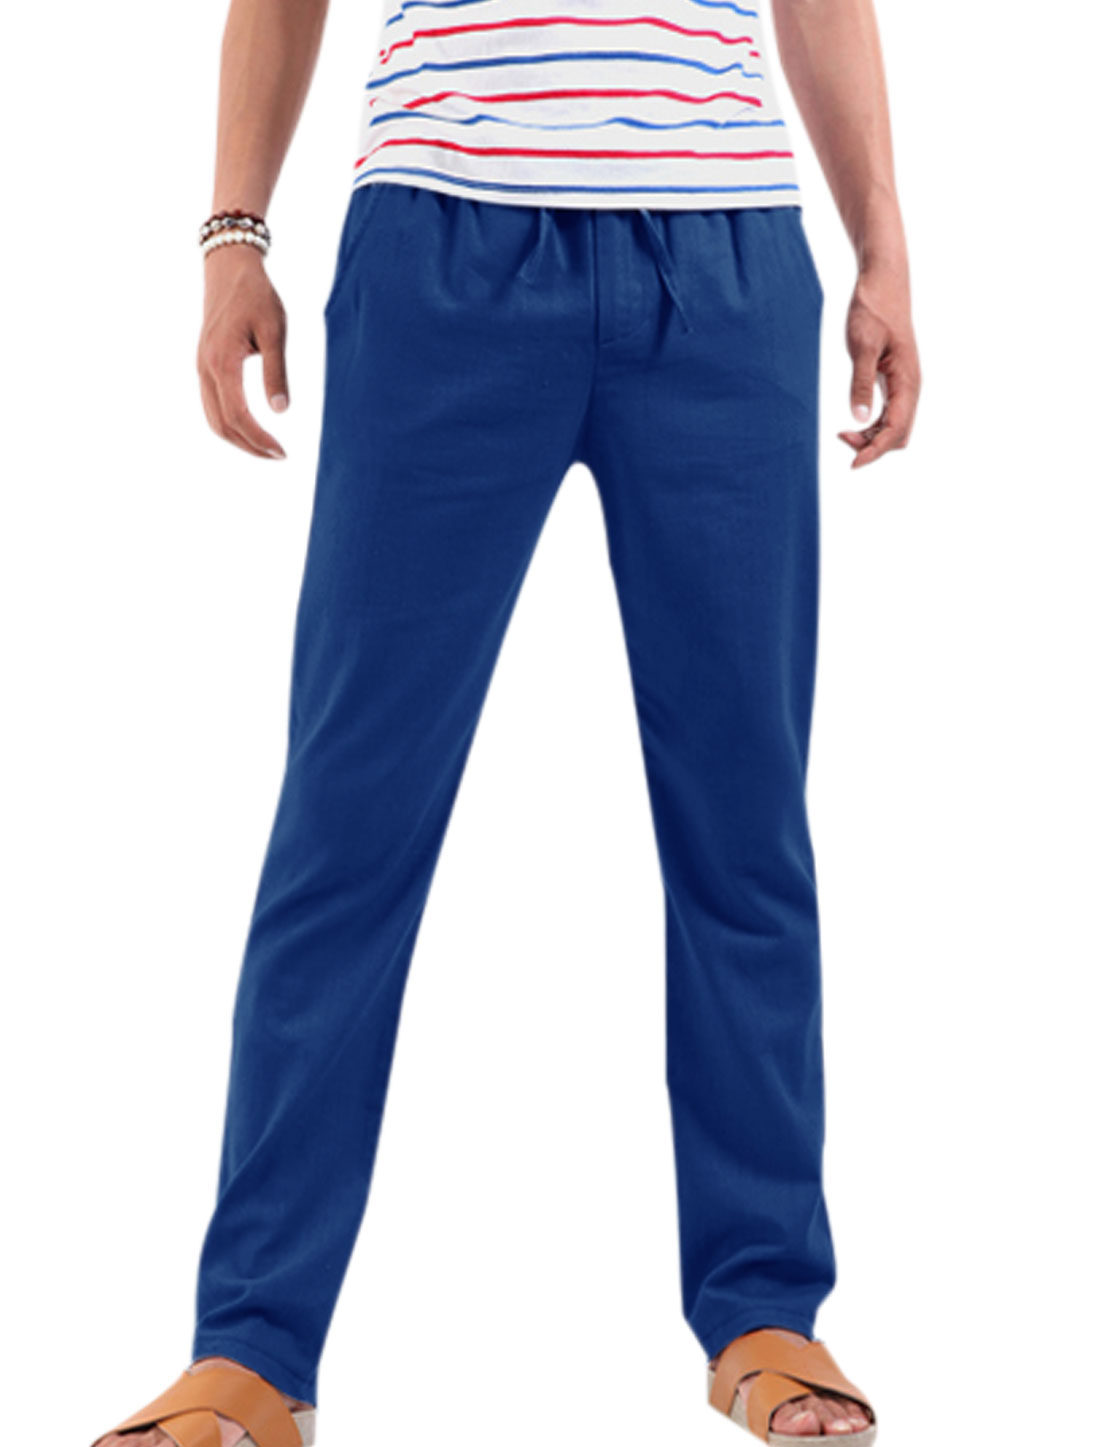 Men Stretchy Drawstring Waist Zipper Closure Pants Royal Blue W28